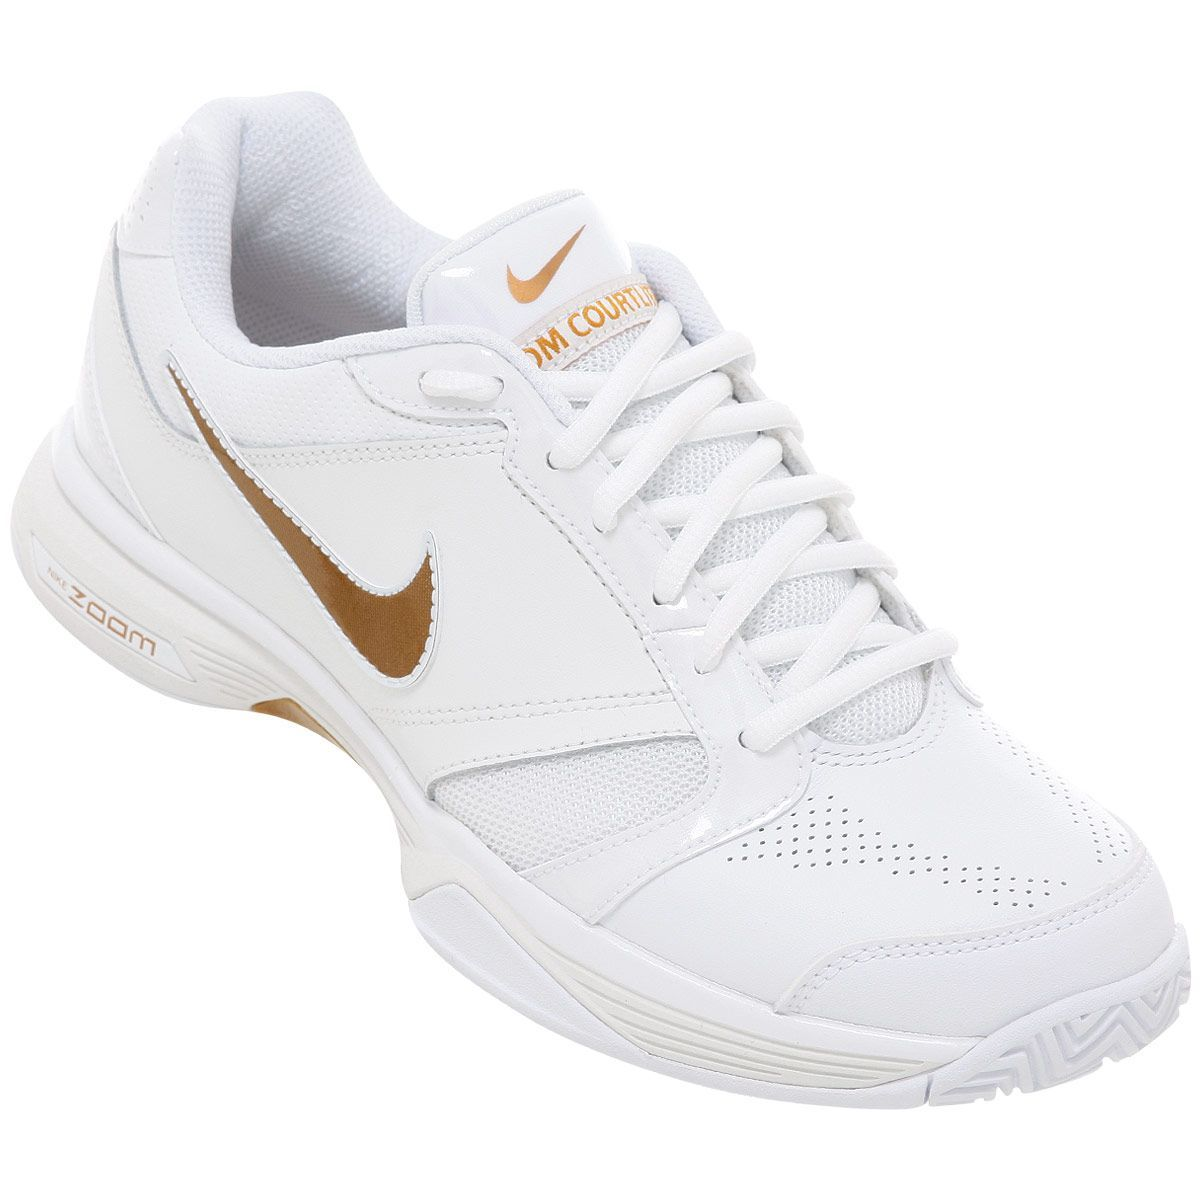 Zapatillas Nike Zoom Courtlite 2 W